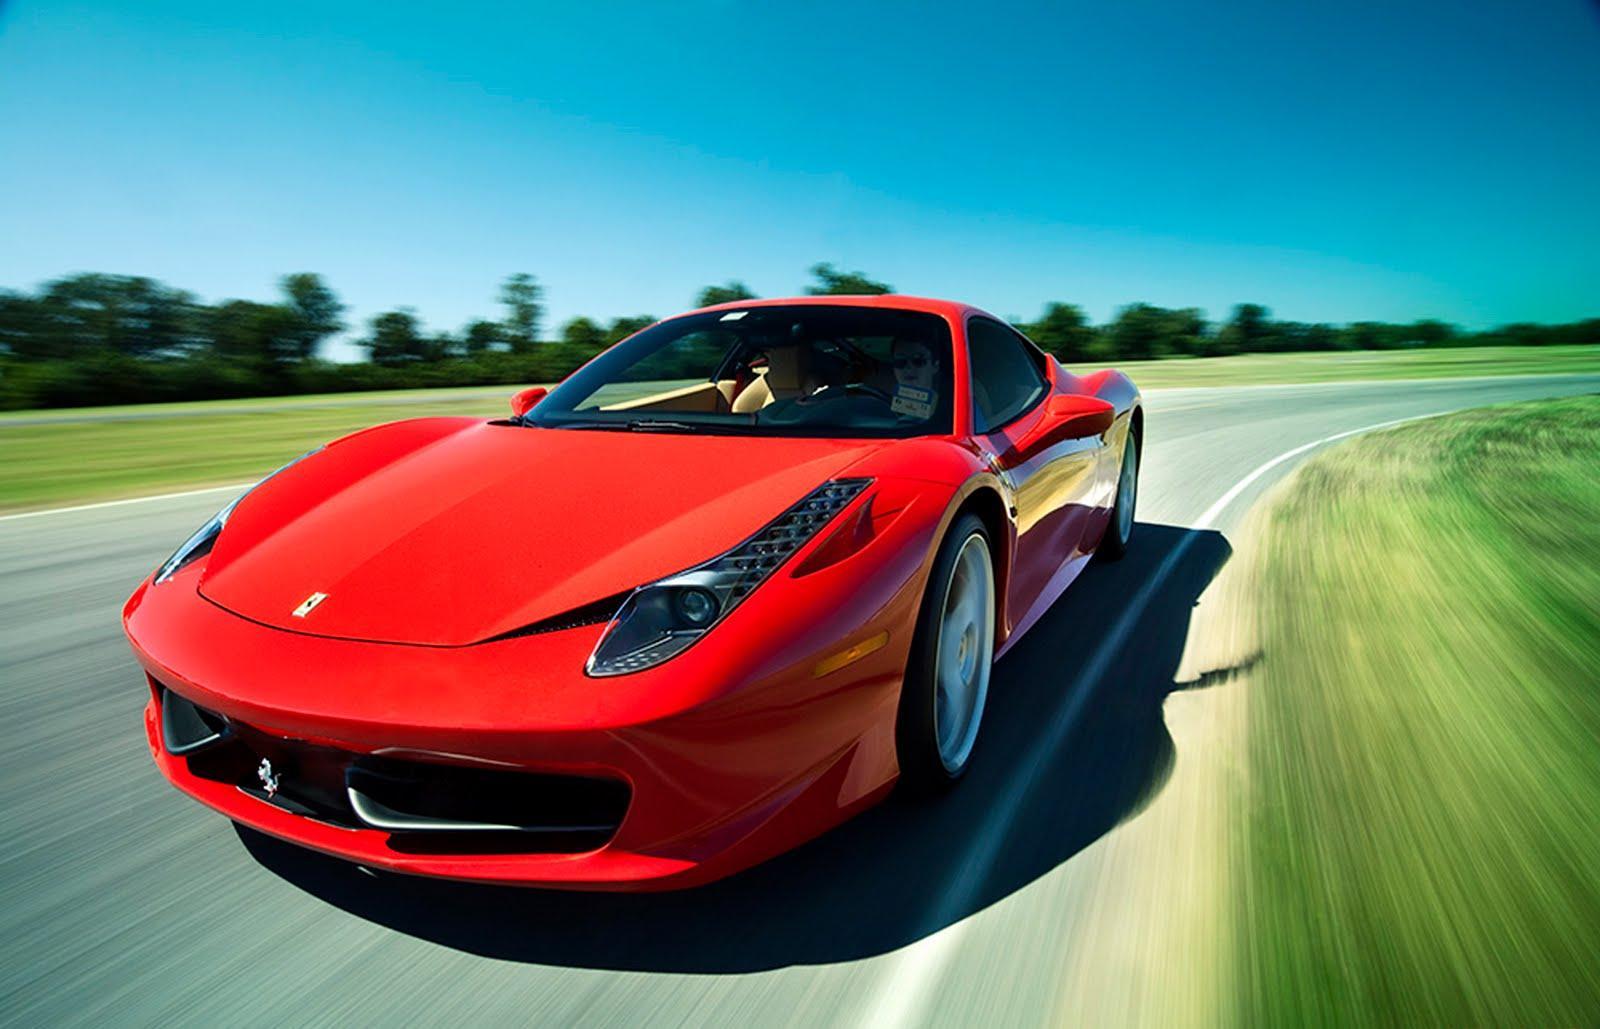 Beautiful Cars Wallpapers - Top Free Beautiful Cars Backgrounds ...